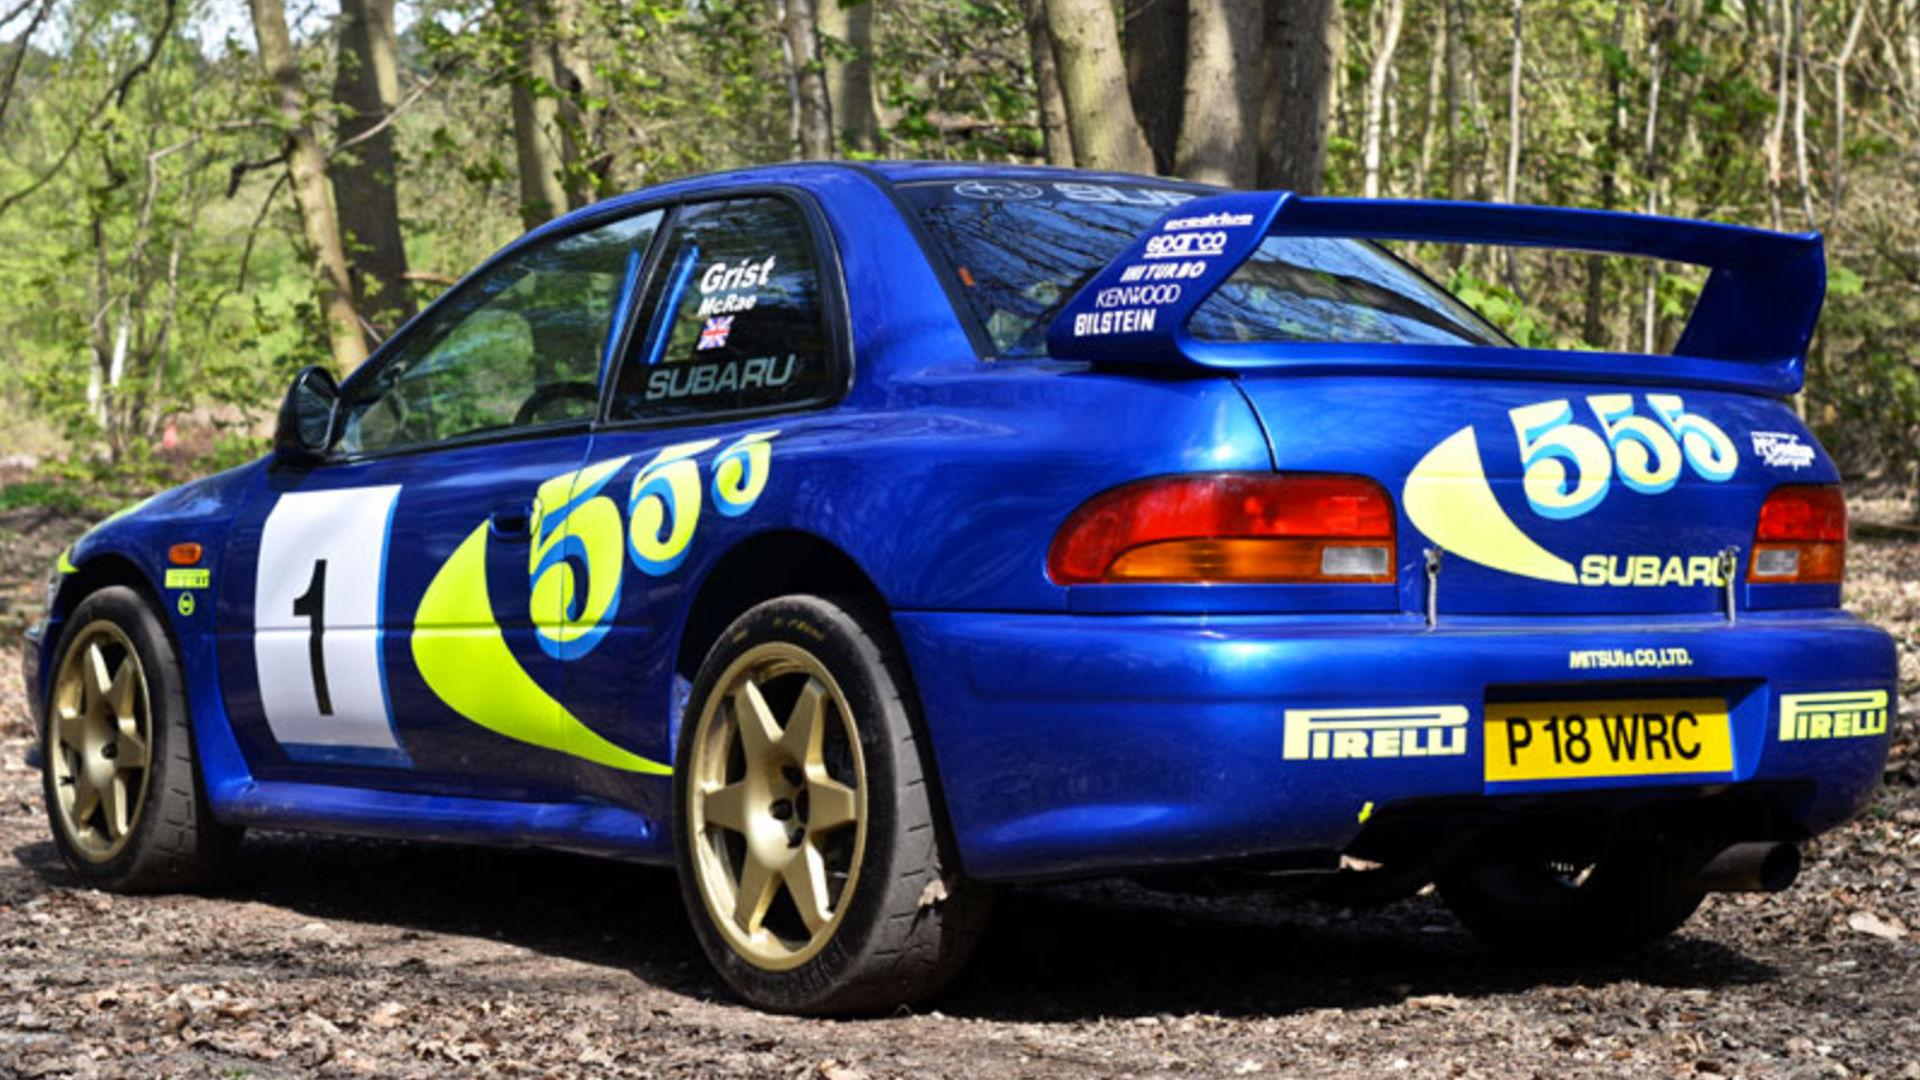 Colin McRae\'s Subaru Impreza WRC Test Car Sells For Nearly $300K